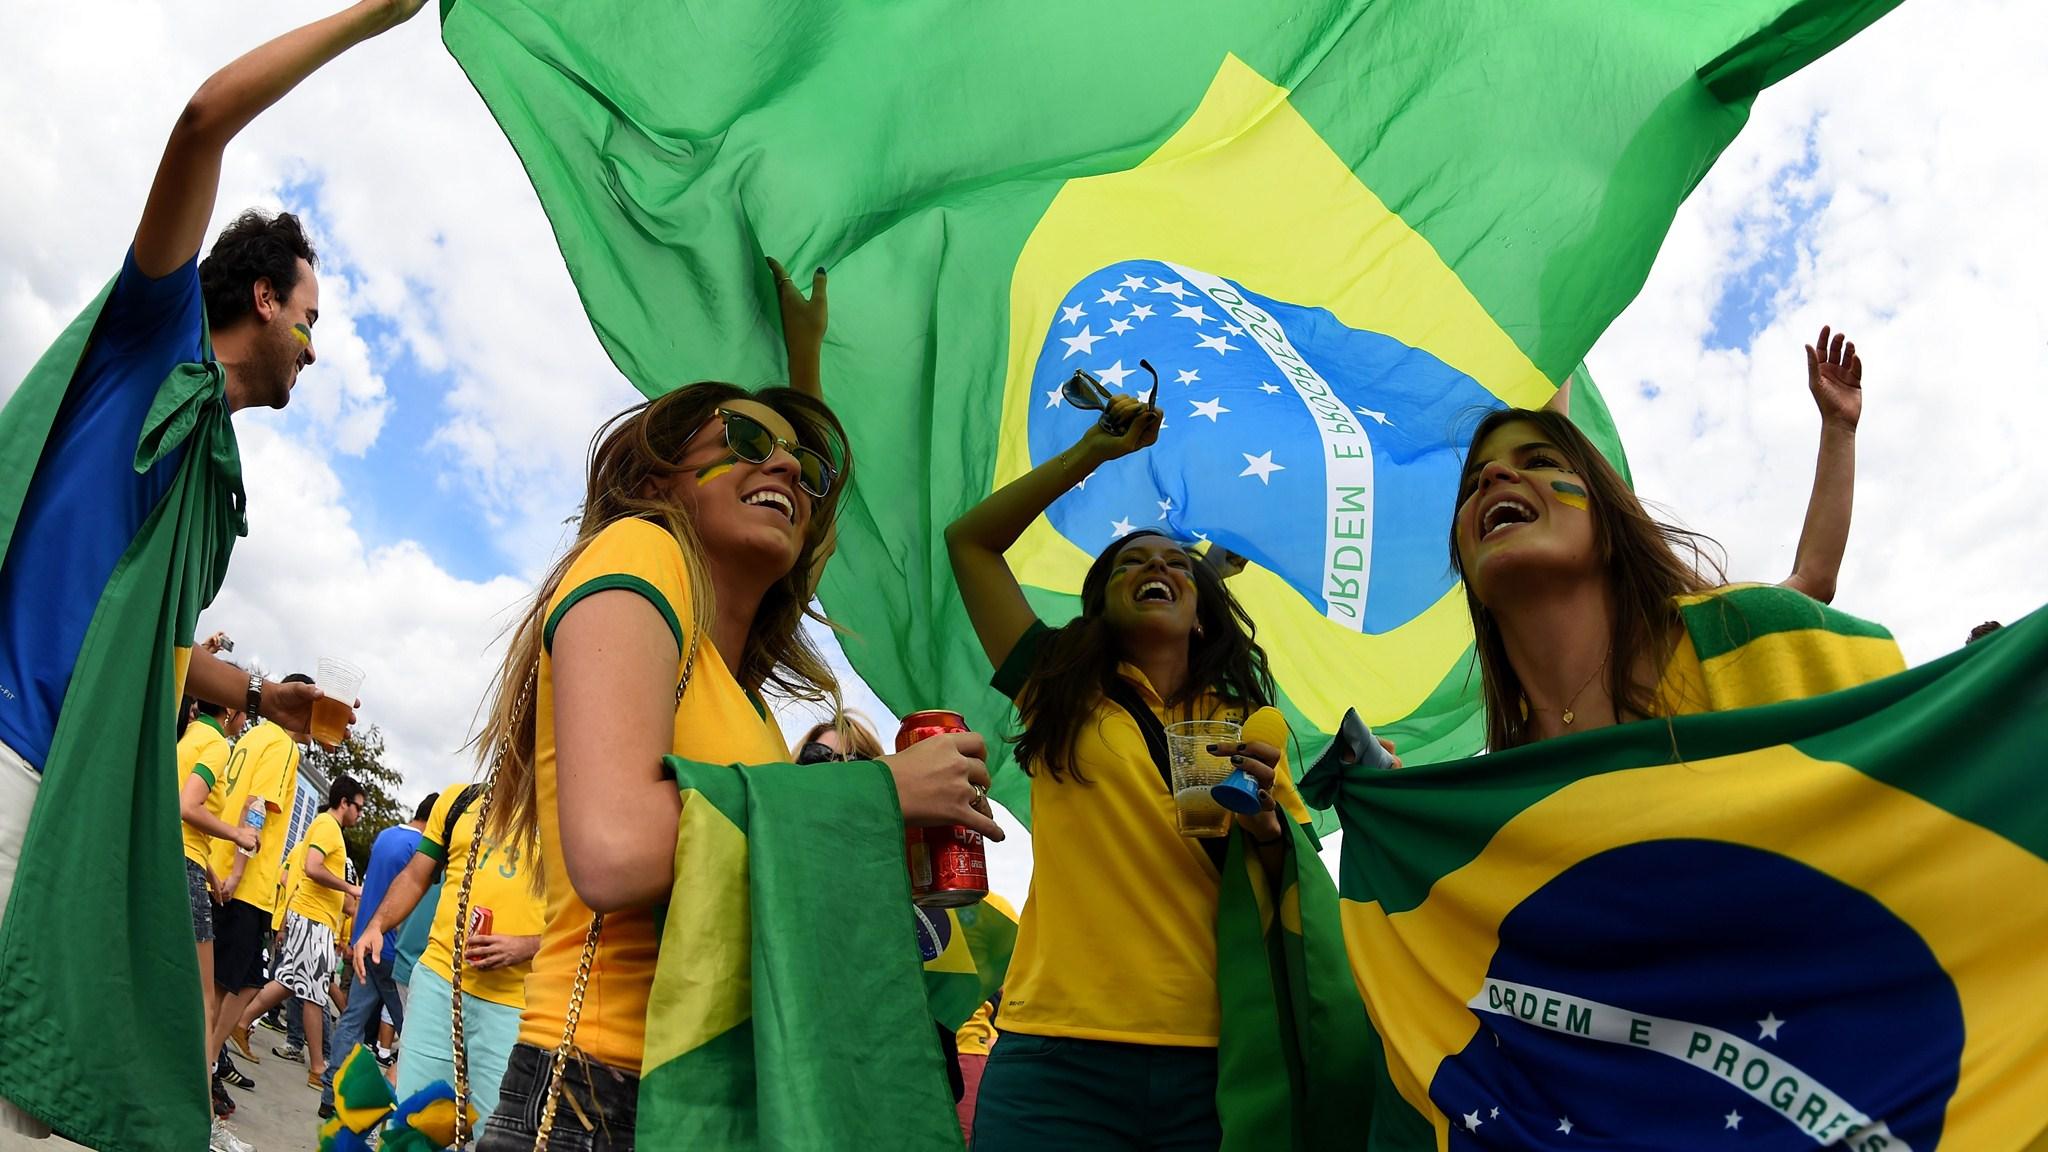 217 - Brazil-Germany [1-7] -- 08 Jul 2014 - 17-00